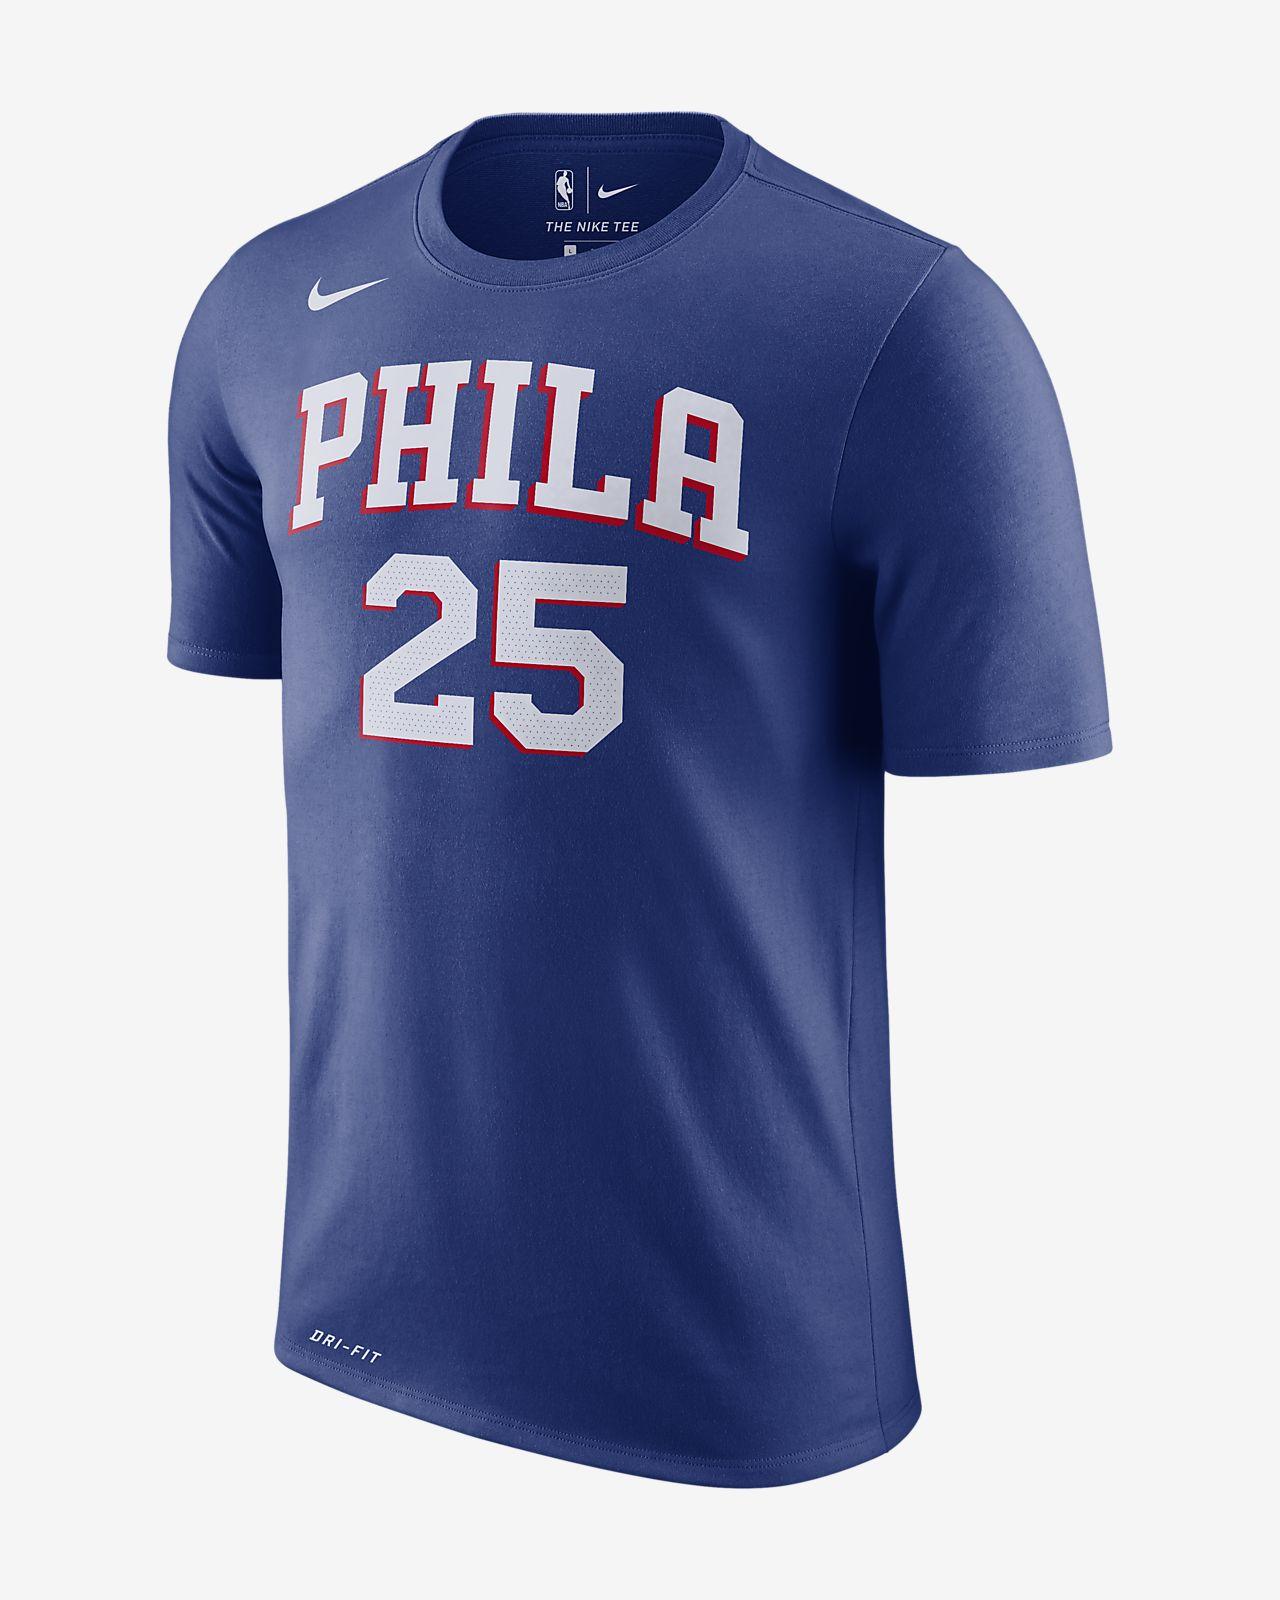 hot sale online eb438 ba5a1 Ben Simmons Philadelphia 76ers Nike Dri-FIT Men's NBA T-Shirt